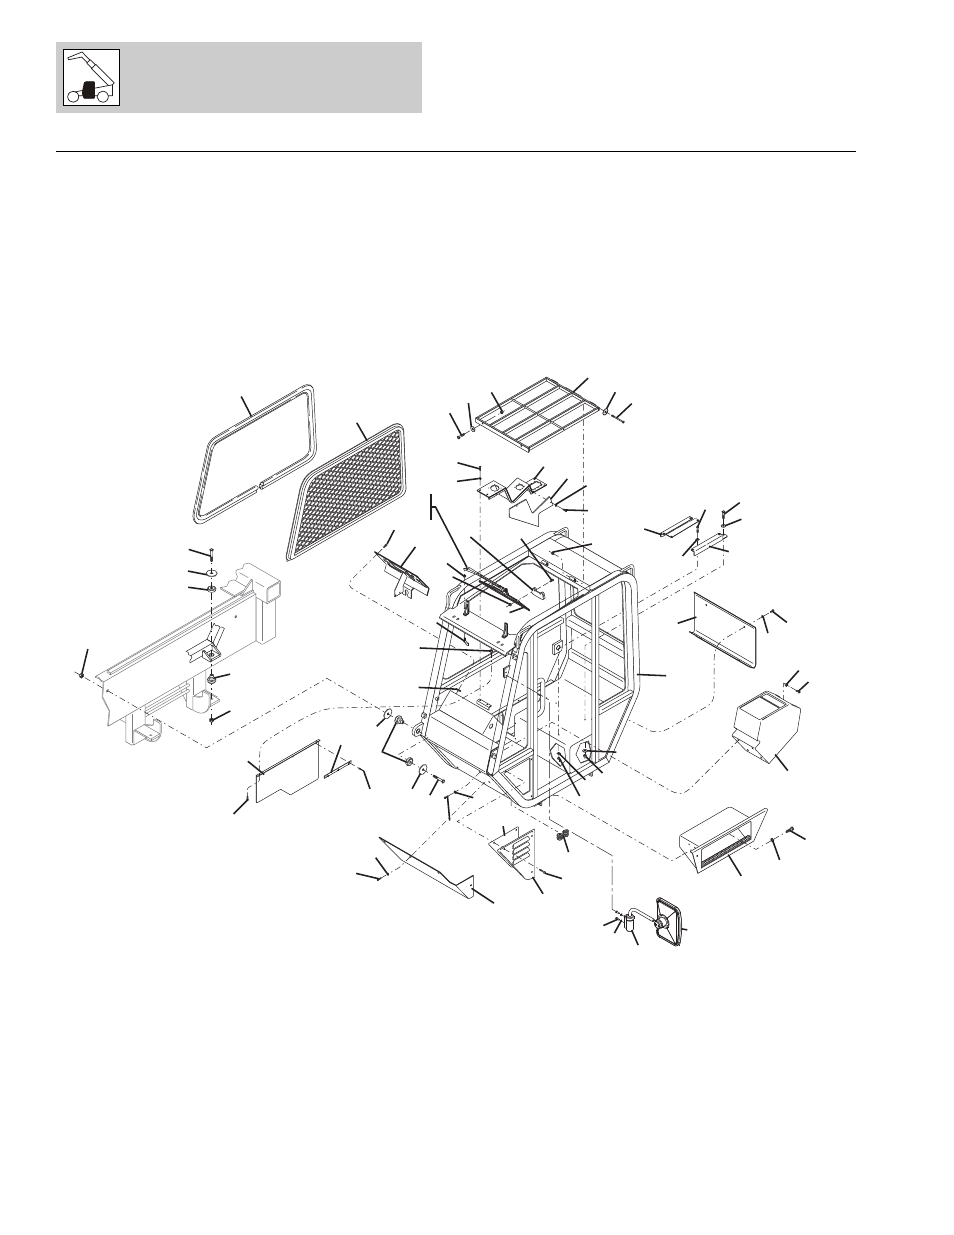 Figure 6-1 operators compartment assembly, Operators